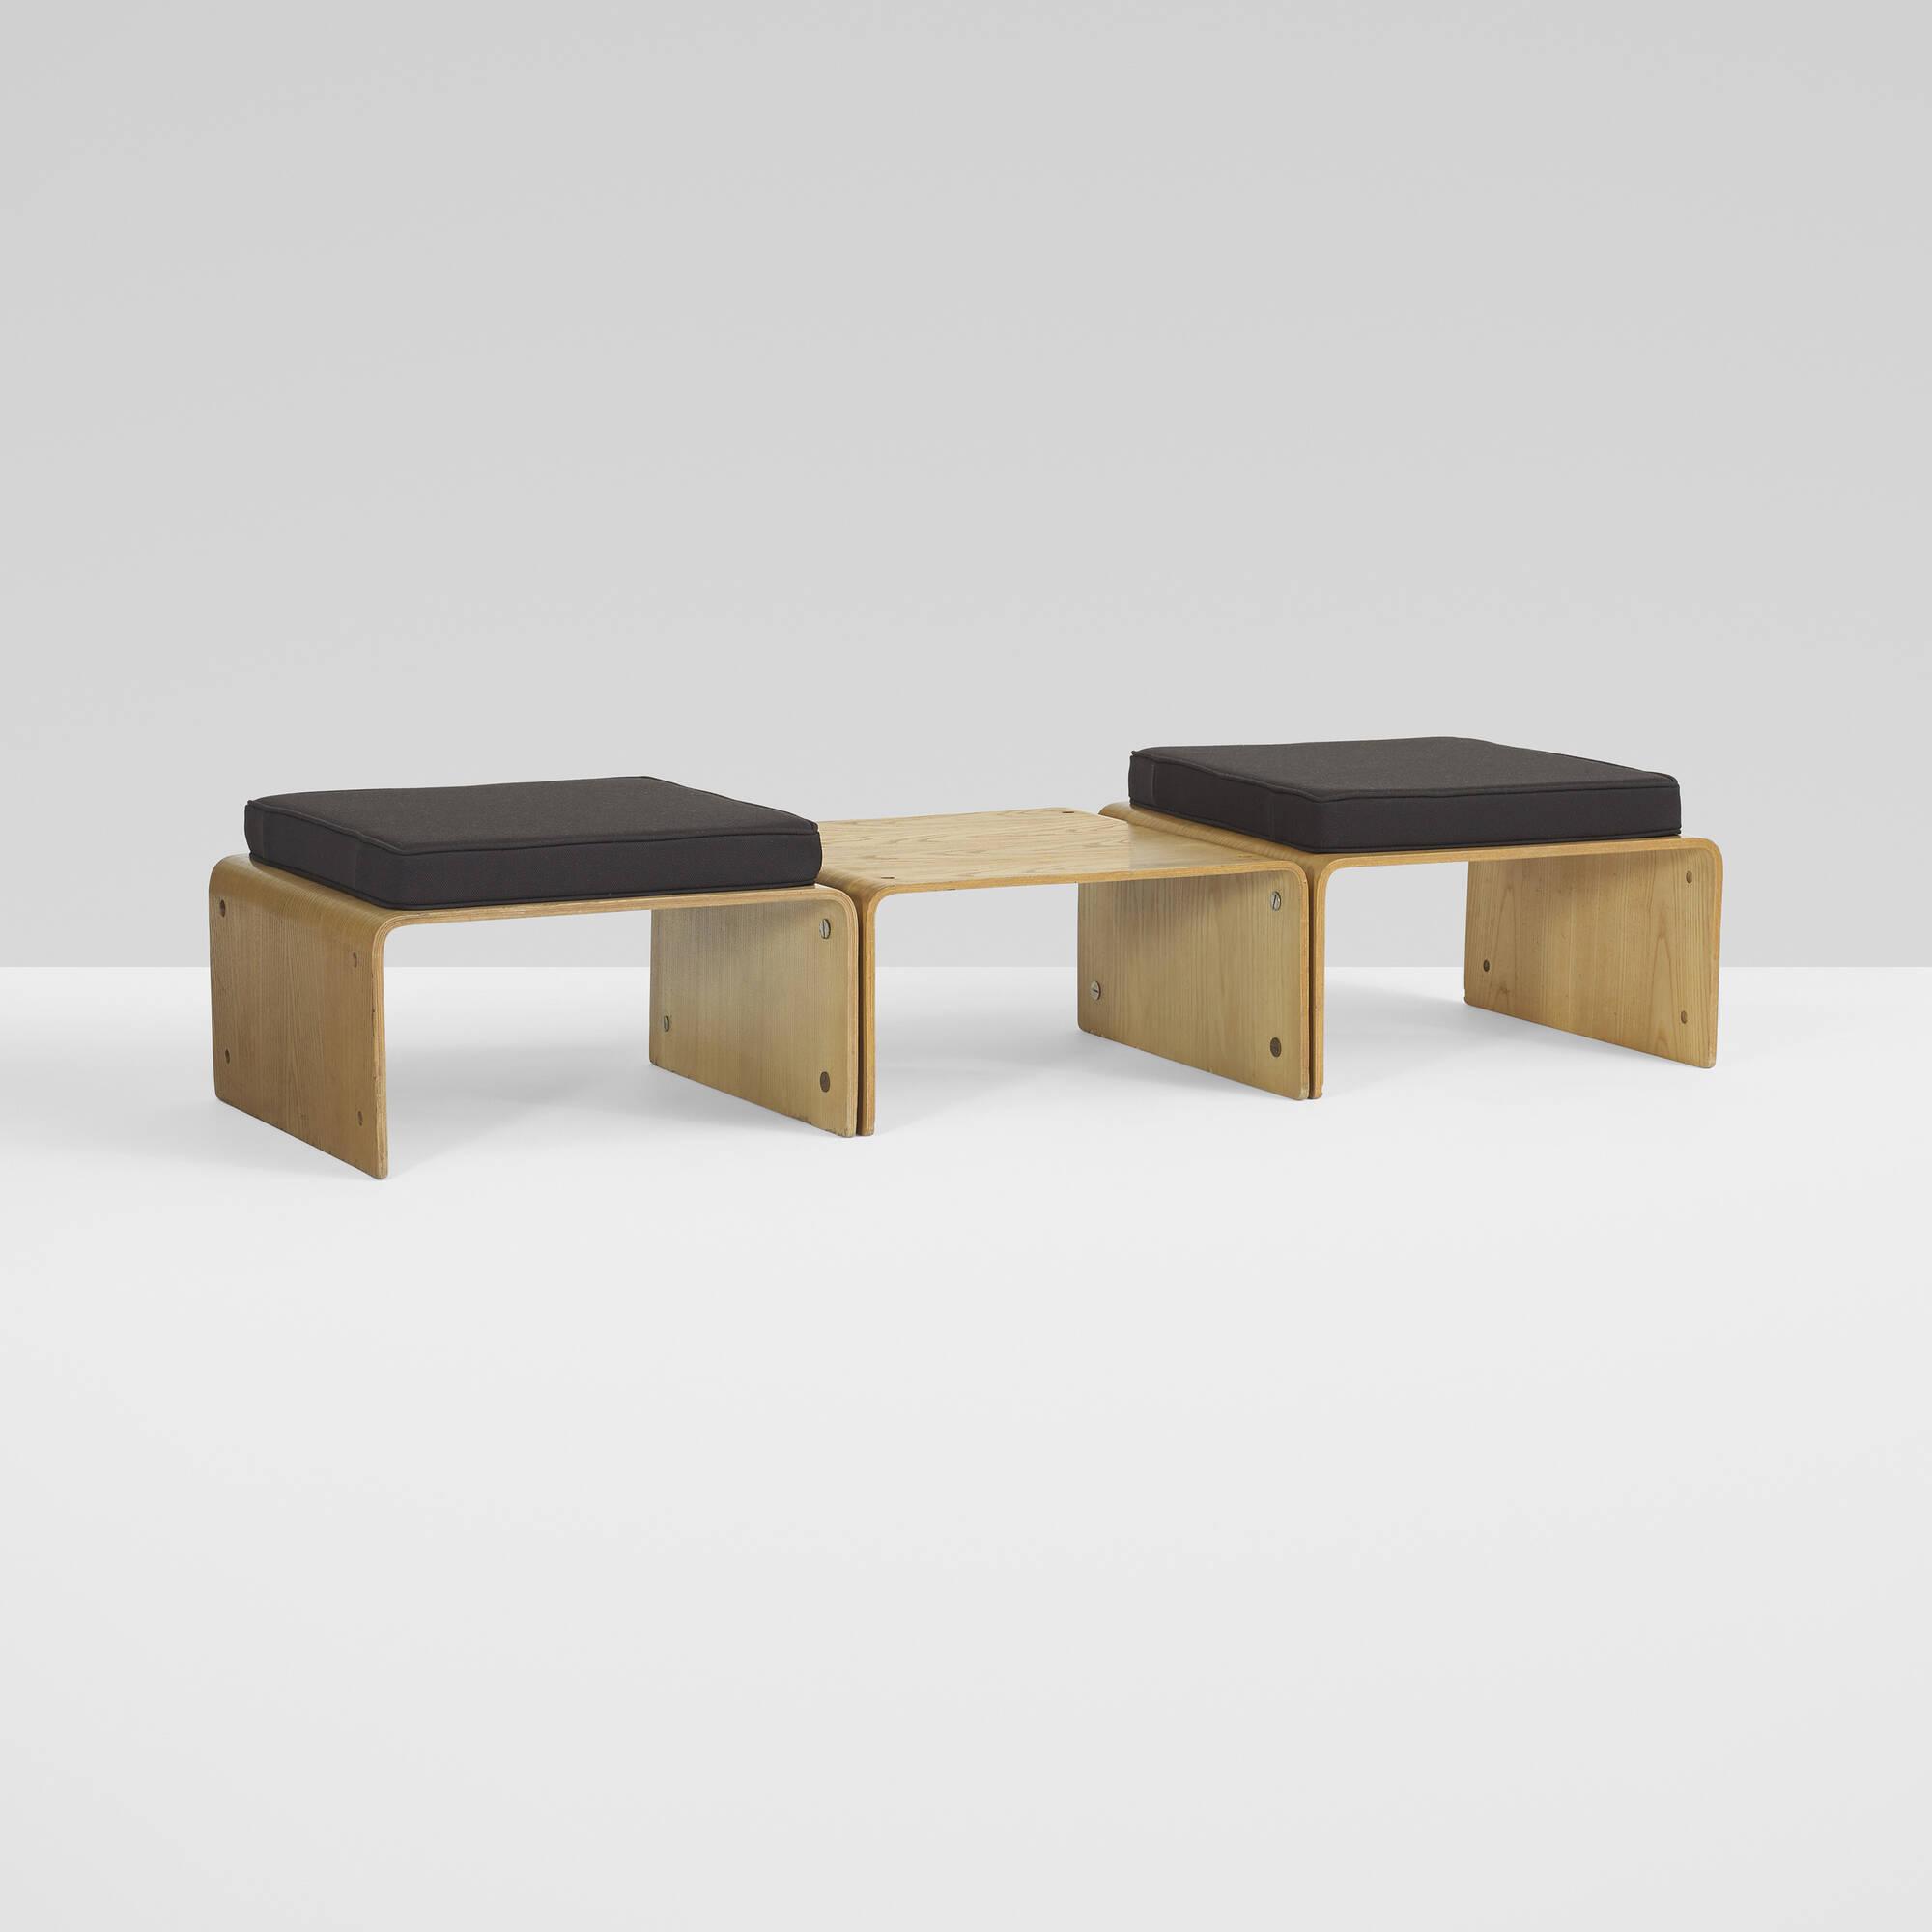 287: roger legrand / pan-u modular system bench < important design